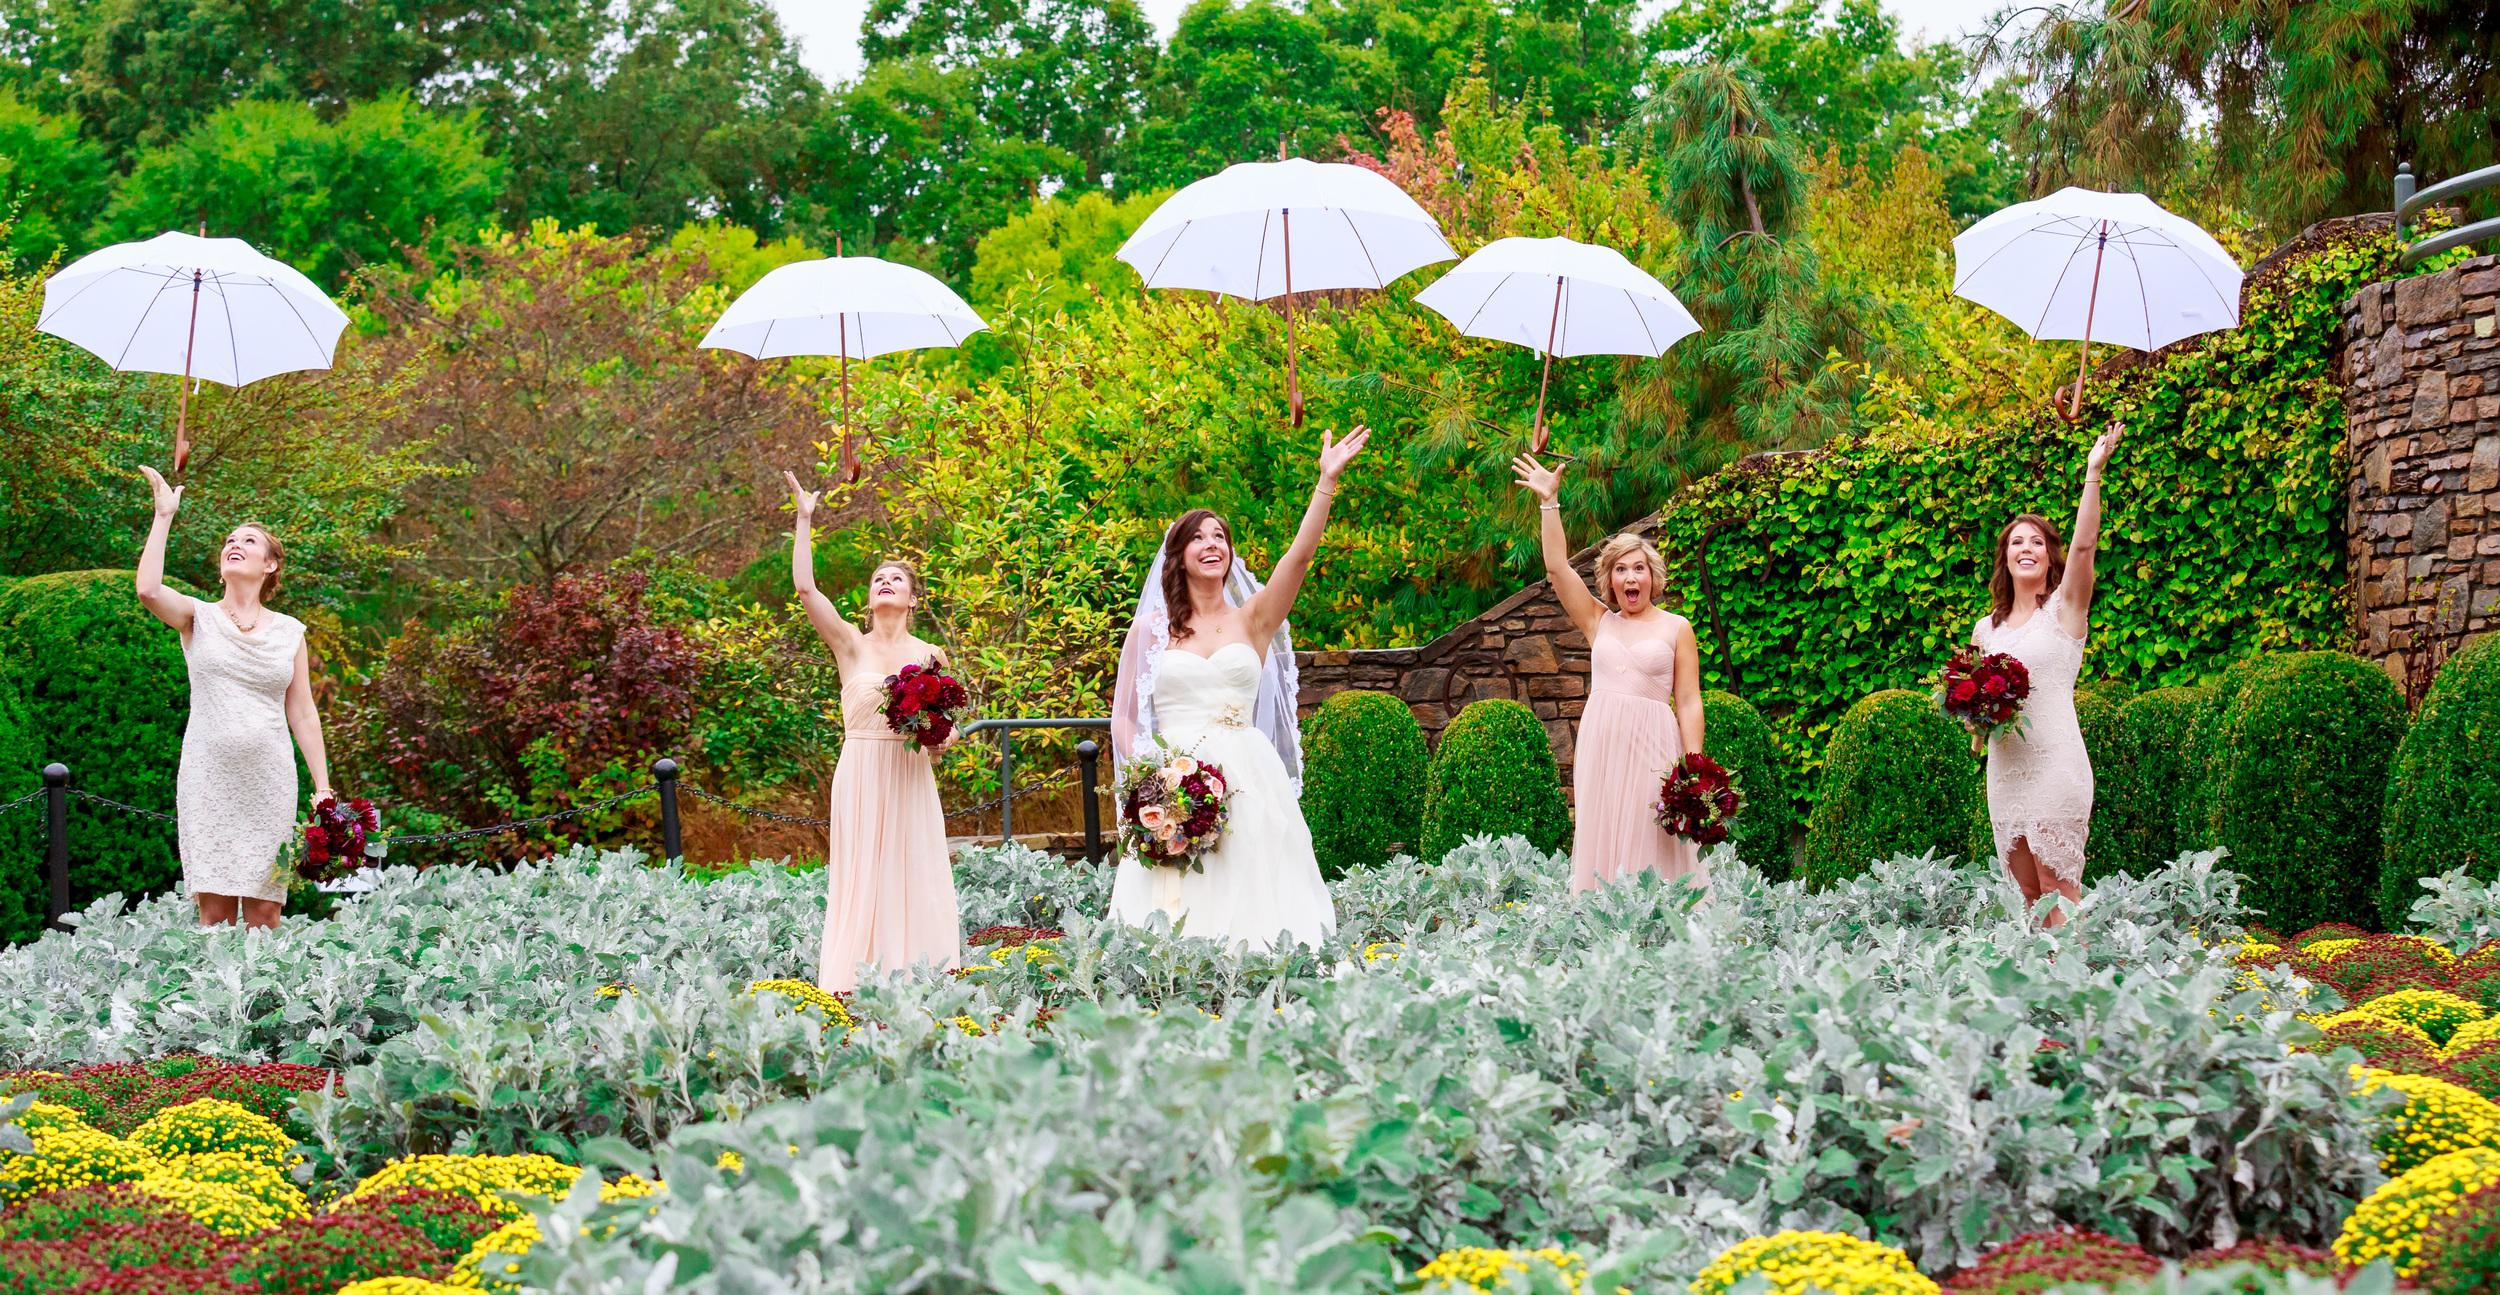 Christine Piascik & Alex McKenzie Wedding at North Carolina Arboretum-20.jpg